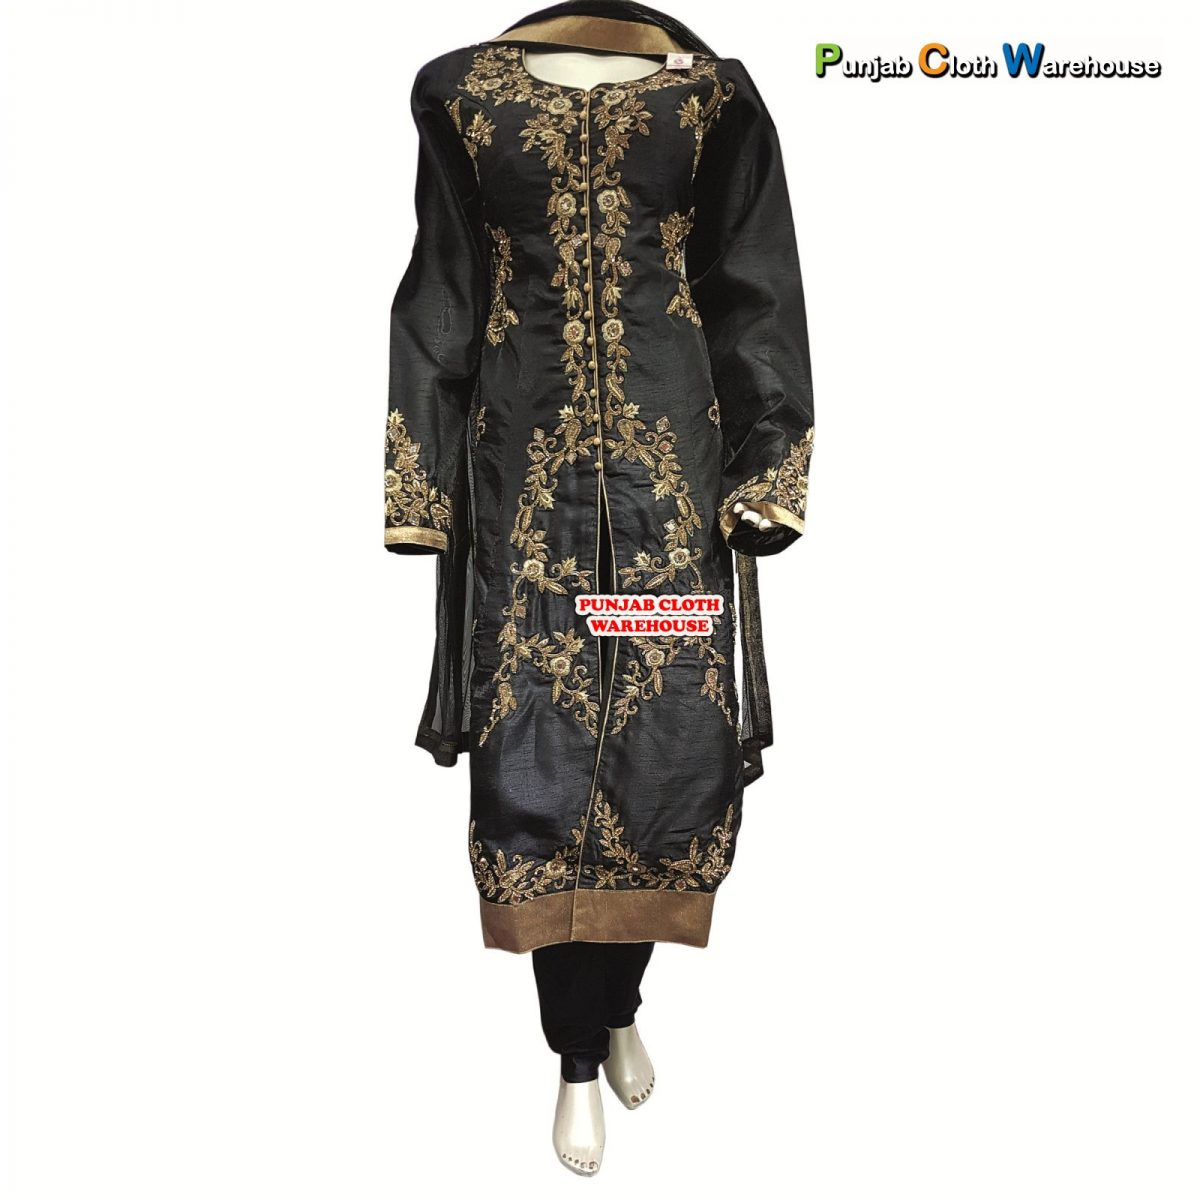 Designer Party Wear Suits, Sarees, Lehengas & Sherwanis (14)